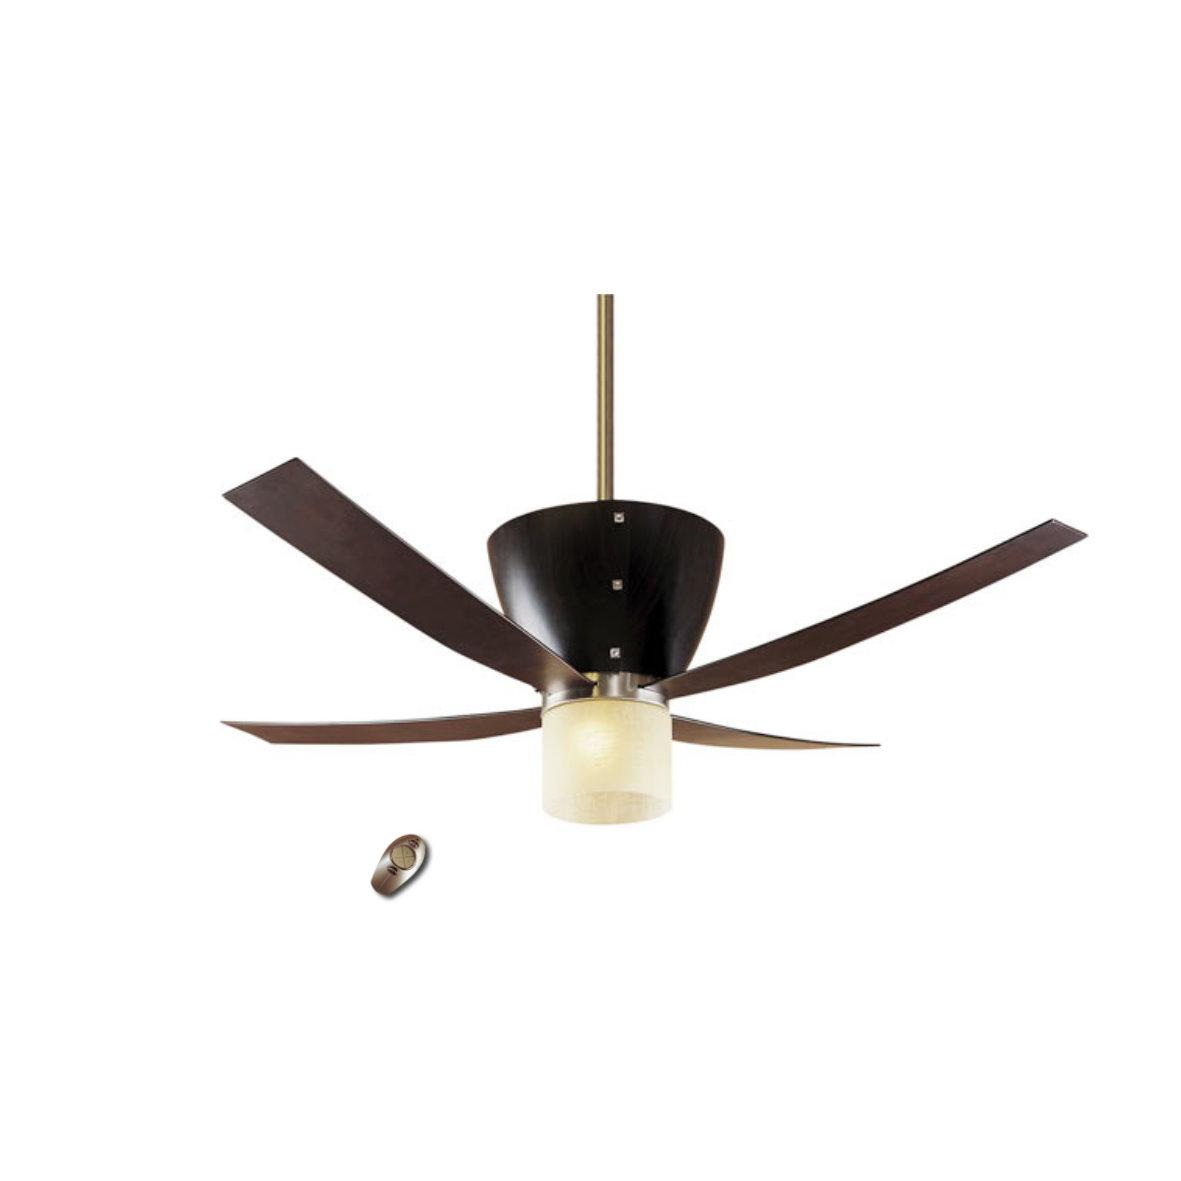 designer decke ventilator hunter valhalla licht. Black Bedroom Furniture Sets. Home Design Ideas